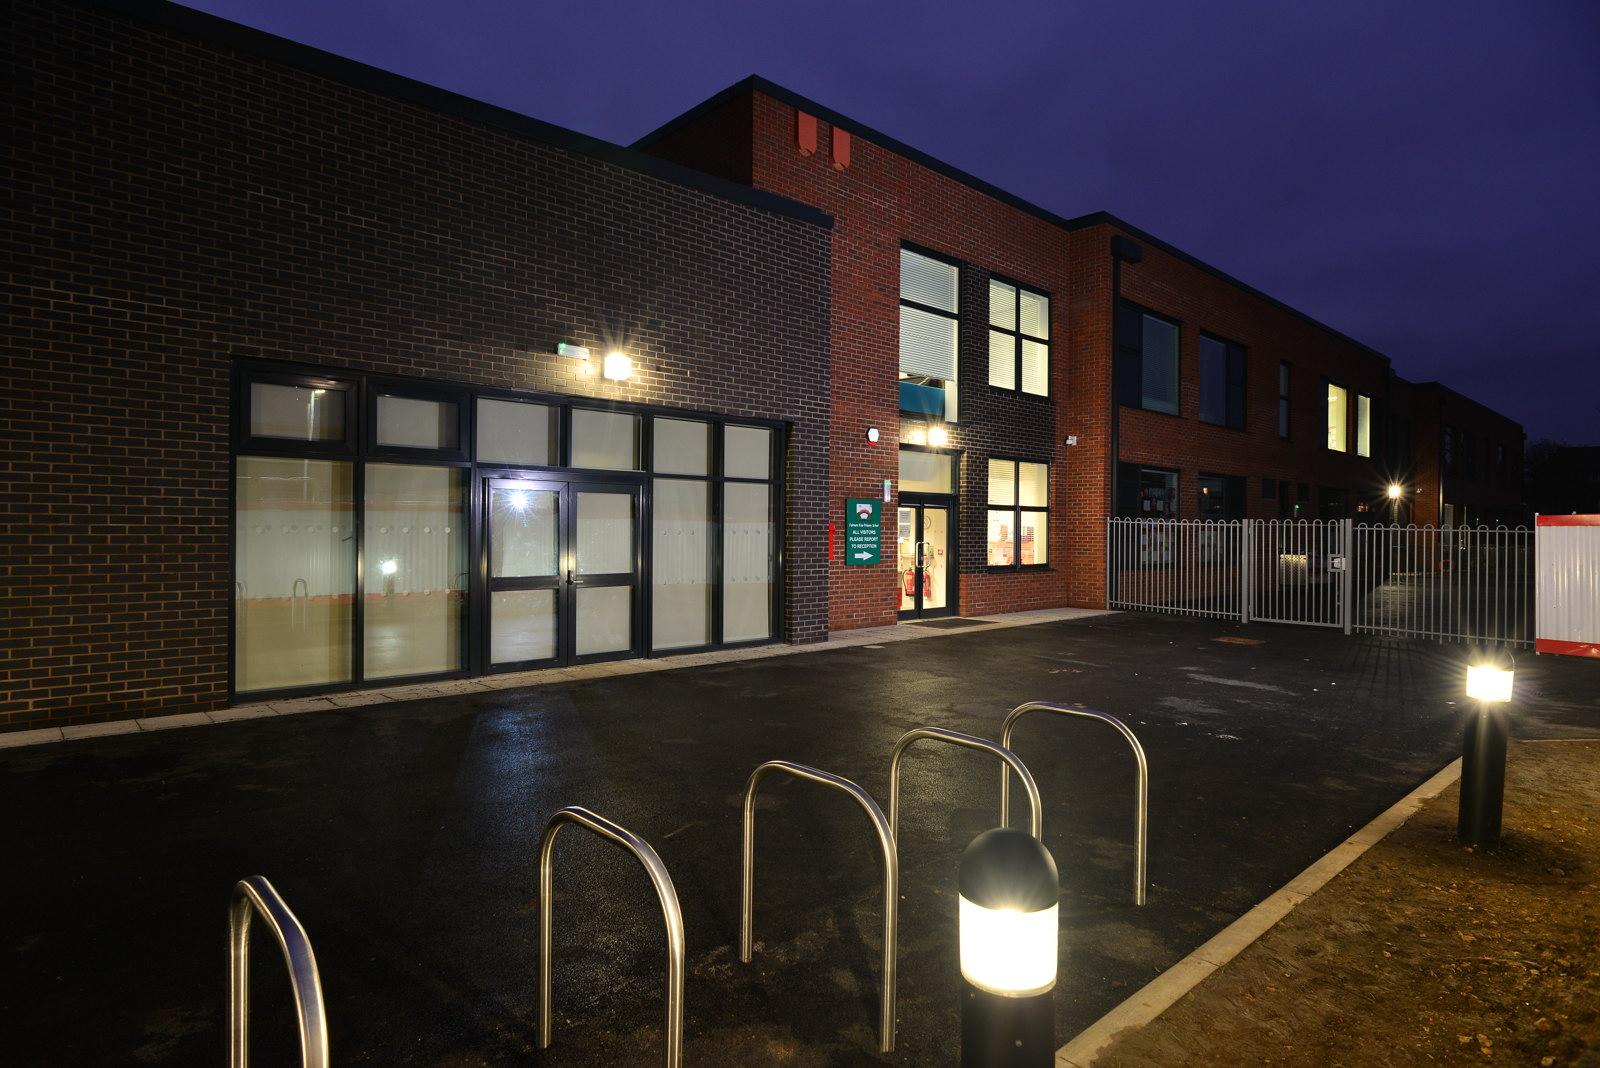 Best Solar Companies >> Fairburn View Primary School - G&H Group